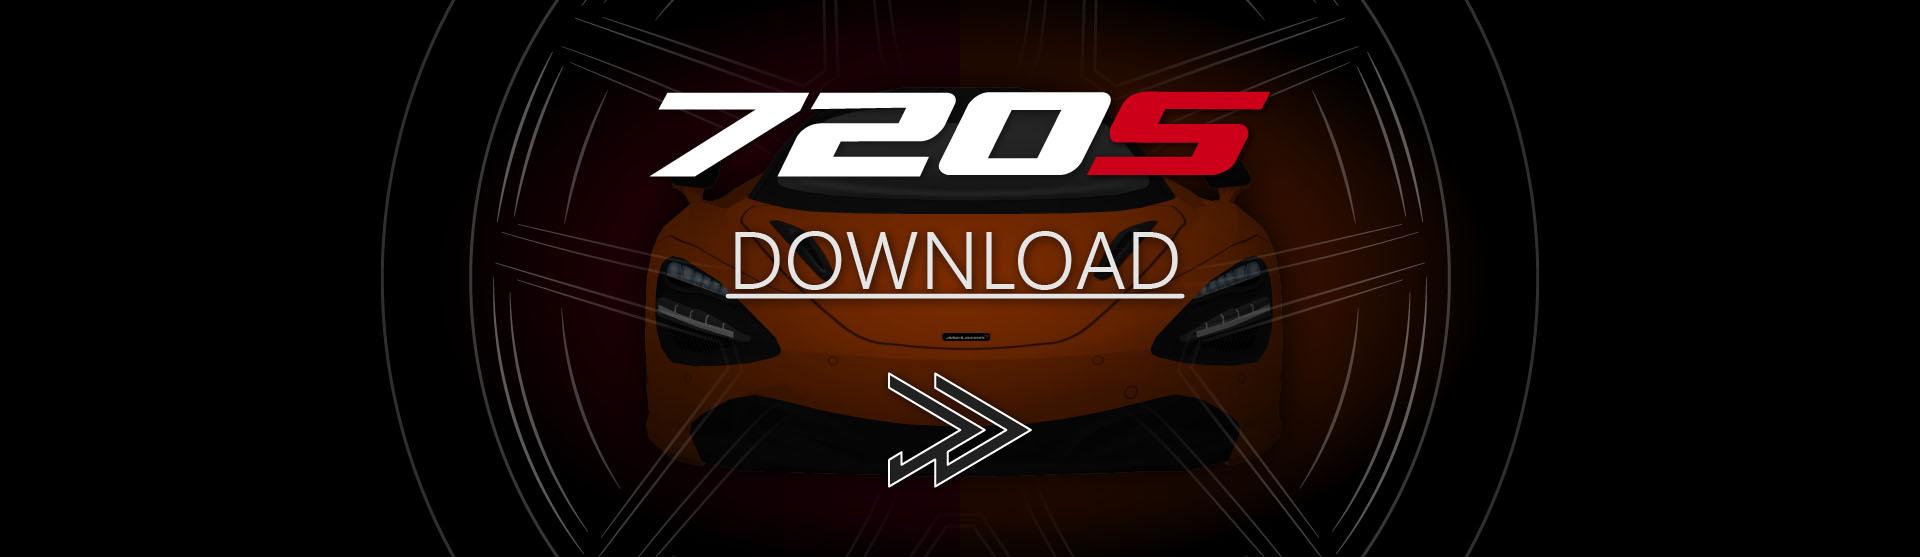 720S Download